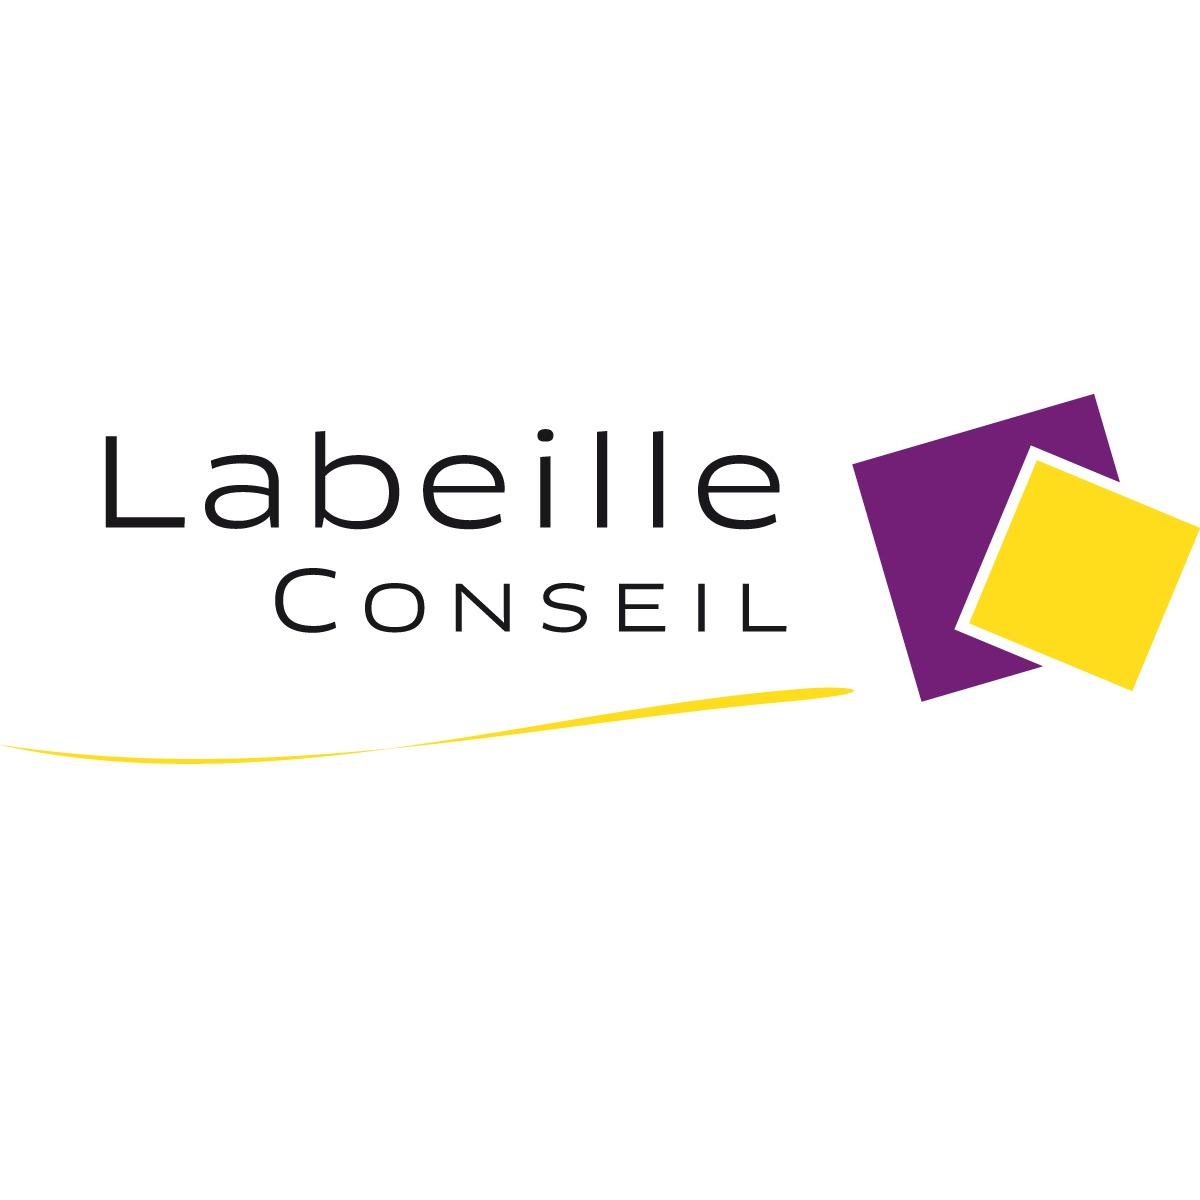 the LABEILLE CONSEIL logo.